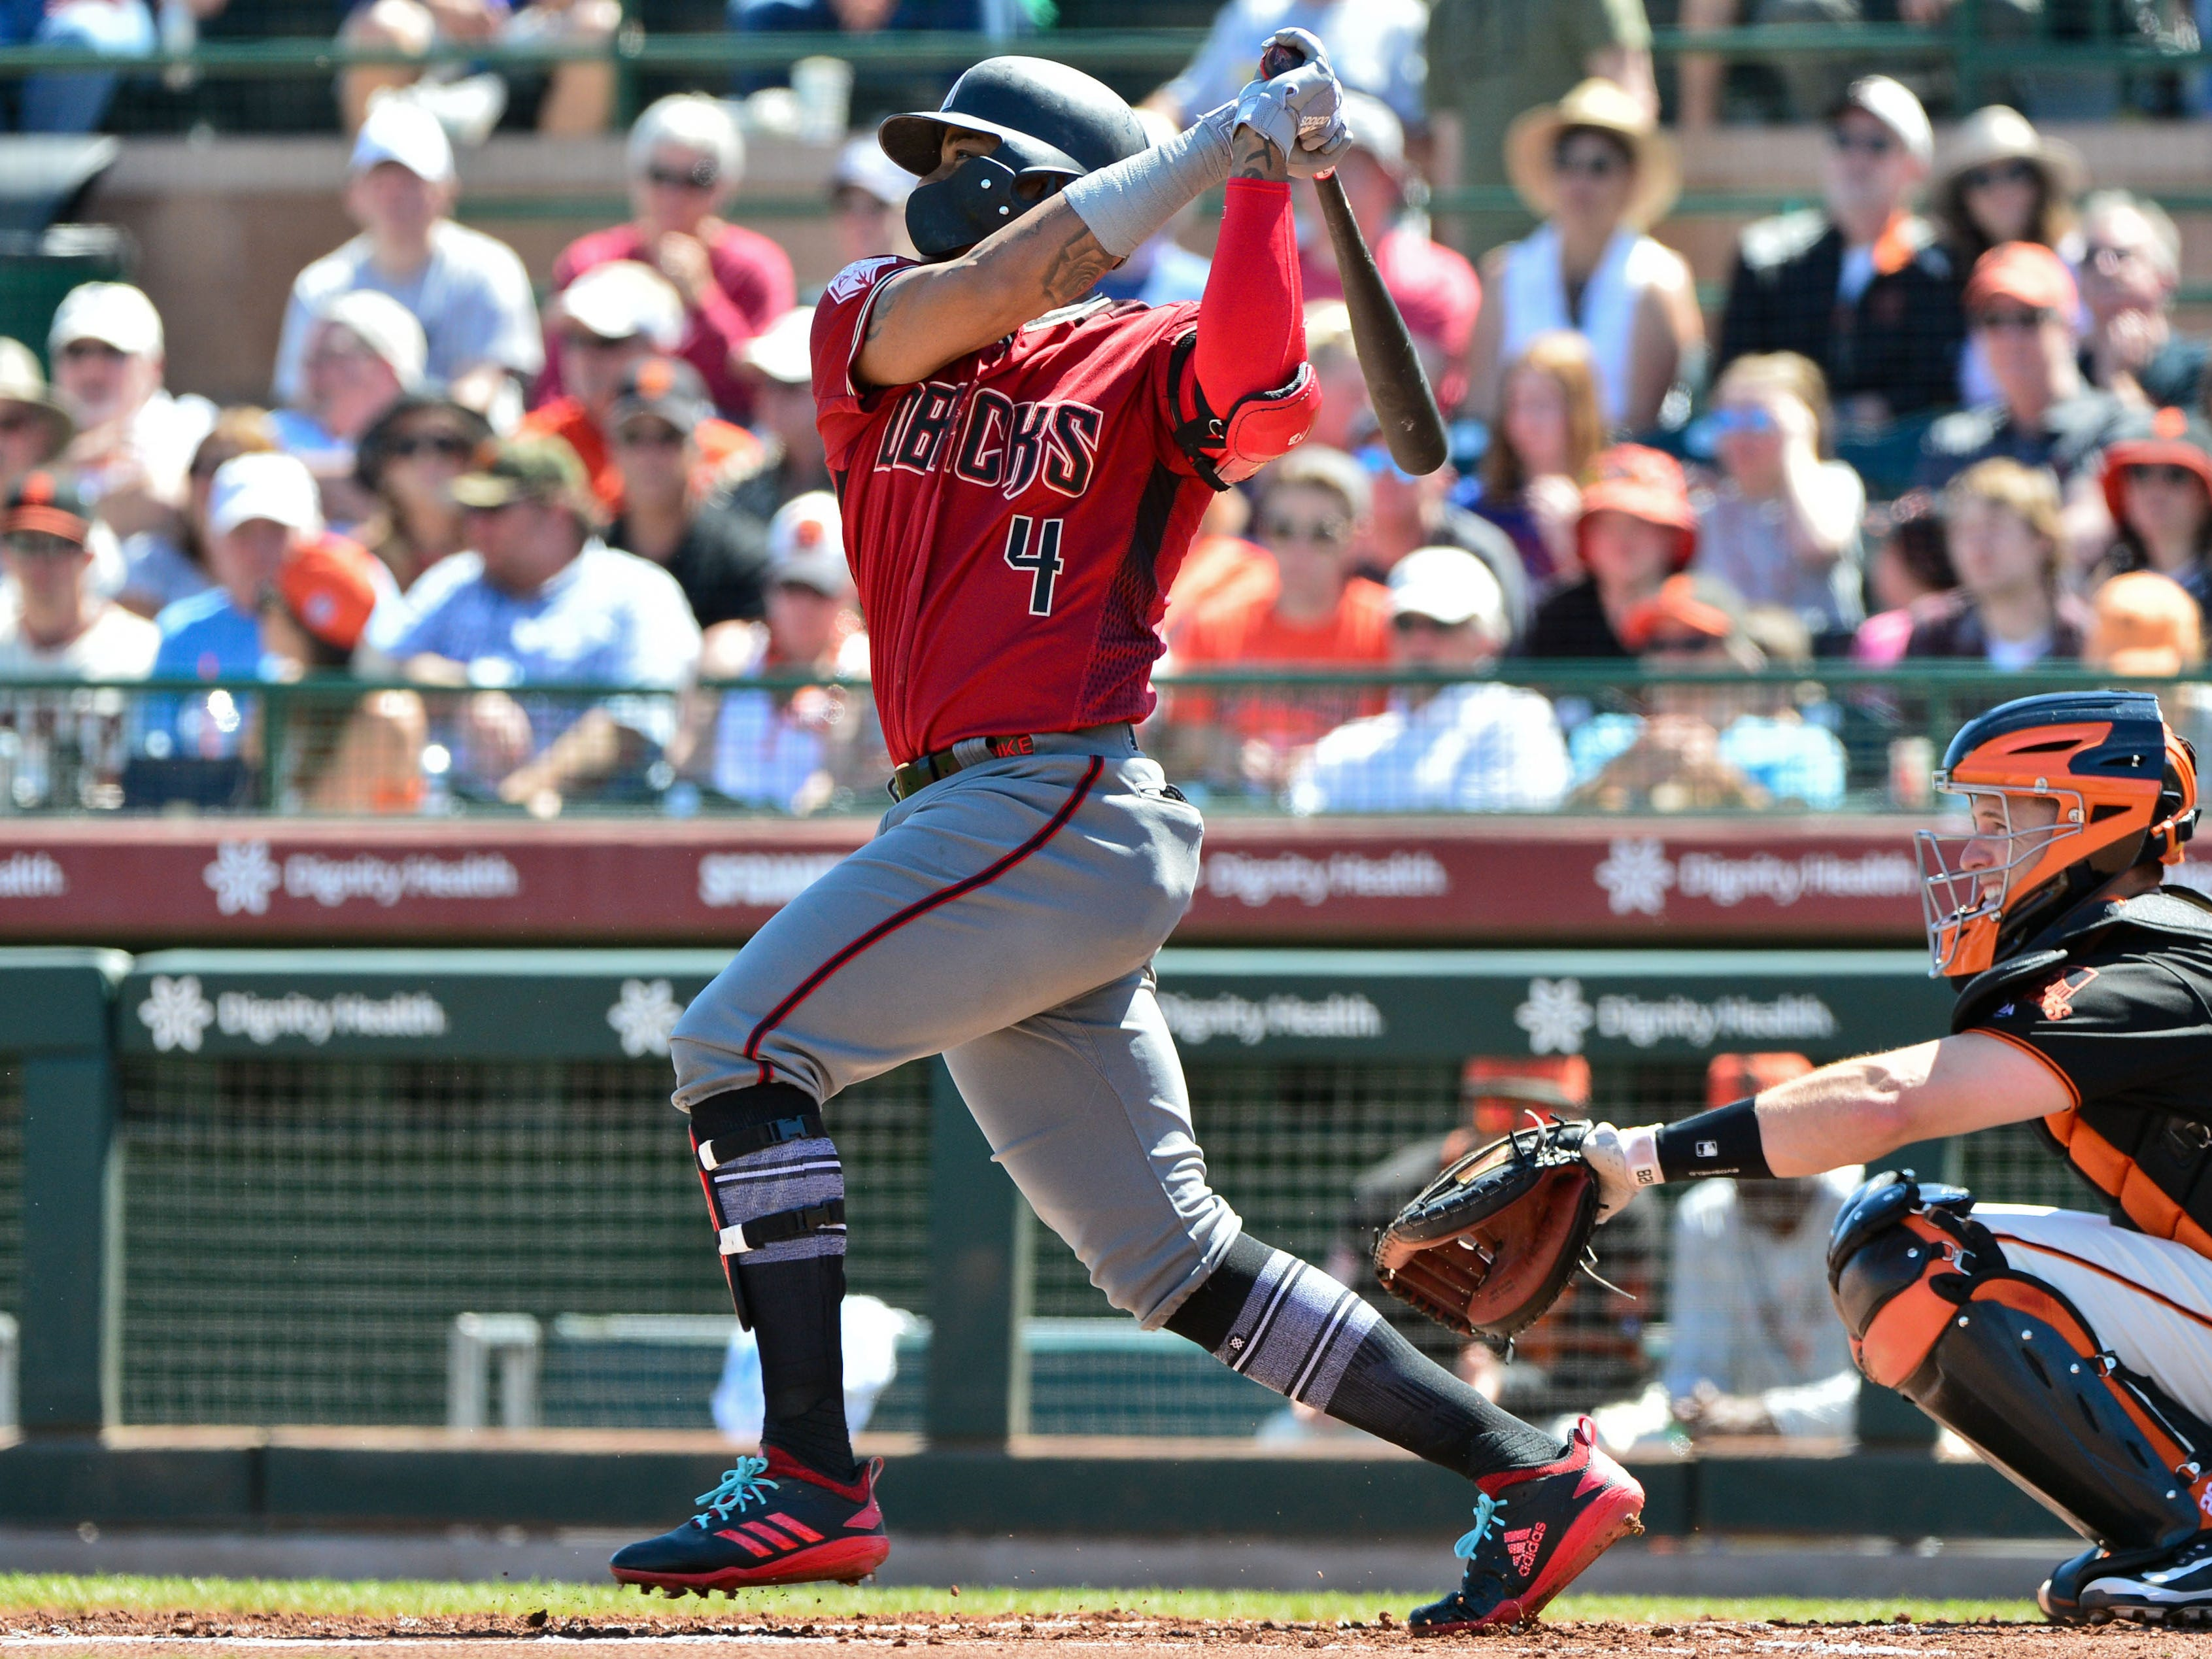 Mar 23, 2019; Scottsdale, AZ, USA; Arizona Diamondbacks shortstop Ketel Marte (4) singles in the first inning against the San Francisco Giants at Scottsdale Stadium.